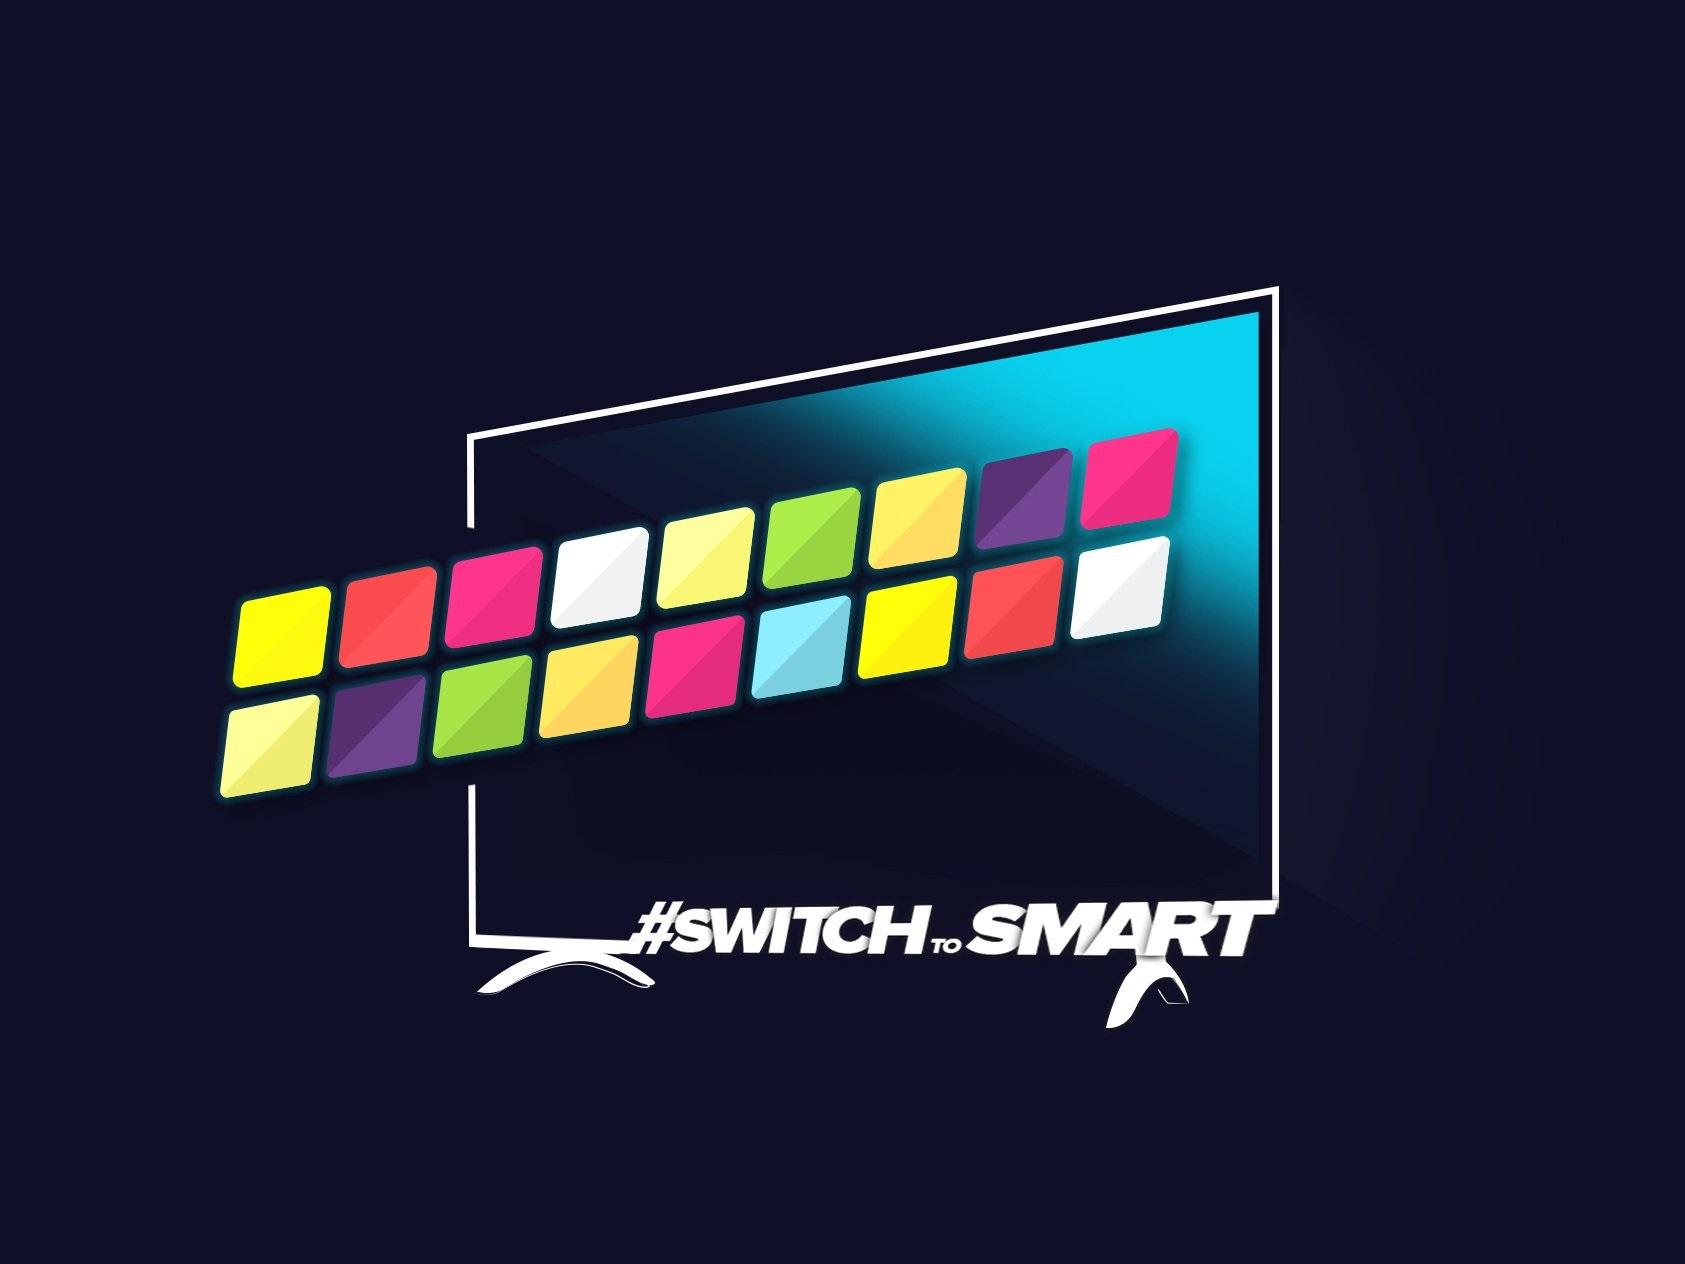 SwitchToSmart